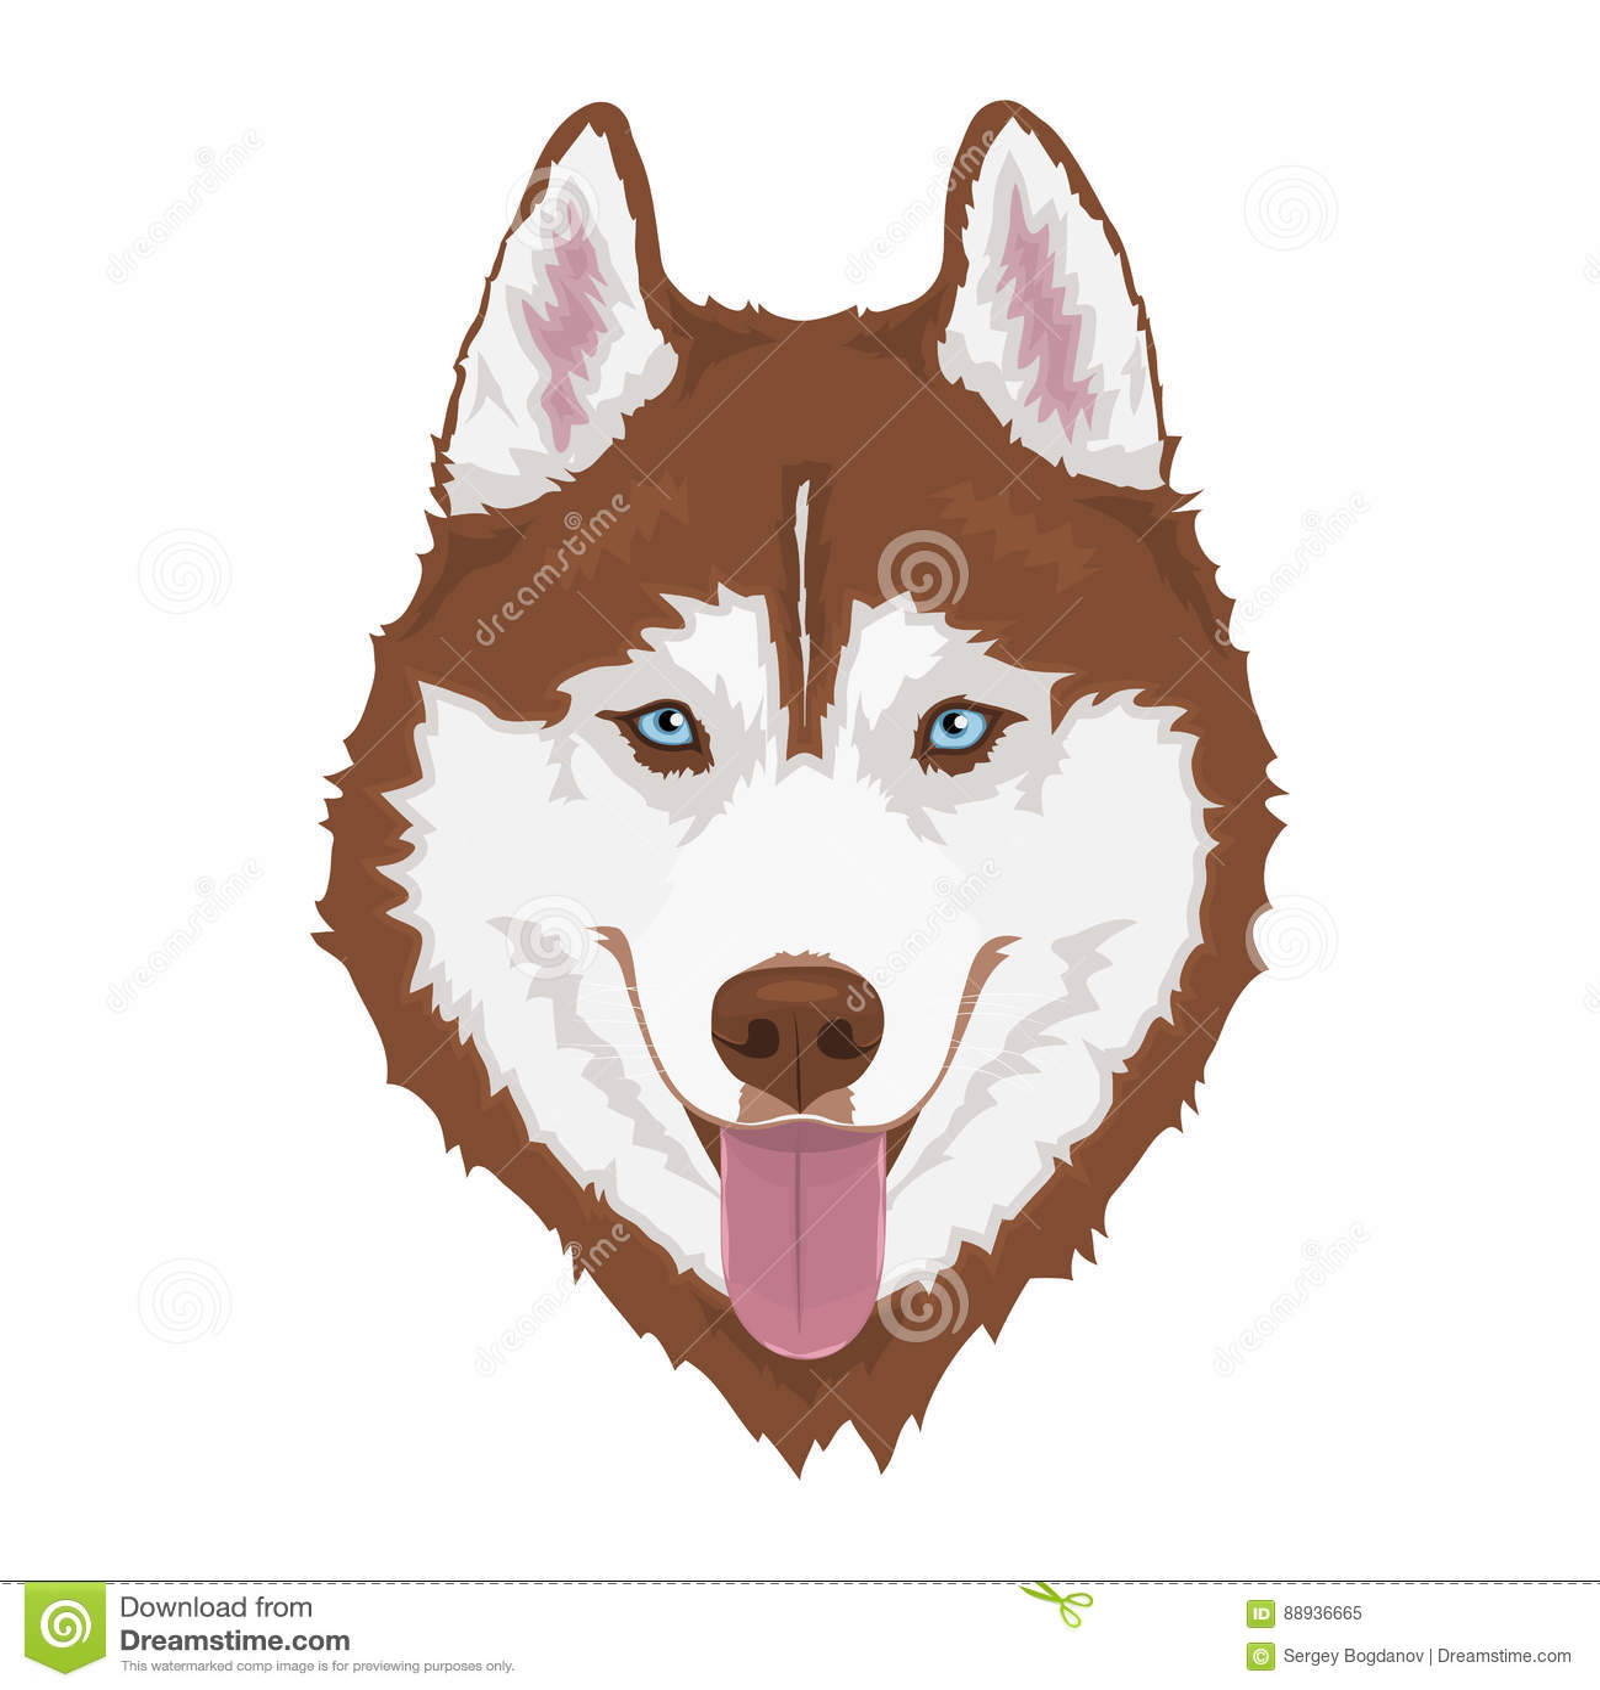 Siberian Husky Dog Stock Vector Illustration Of Canine 88936665